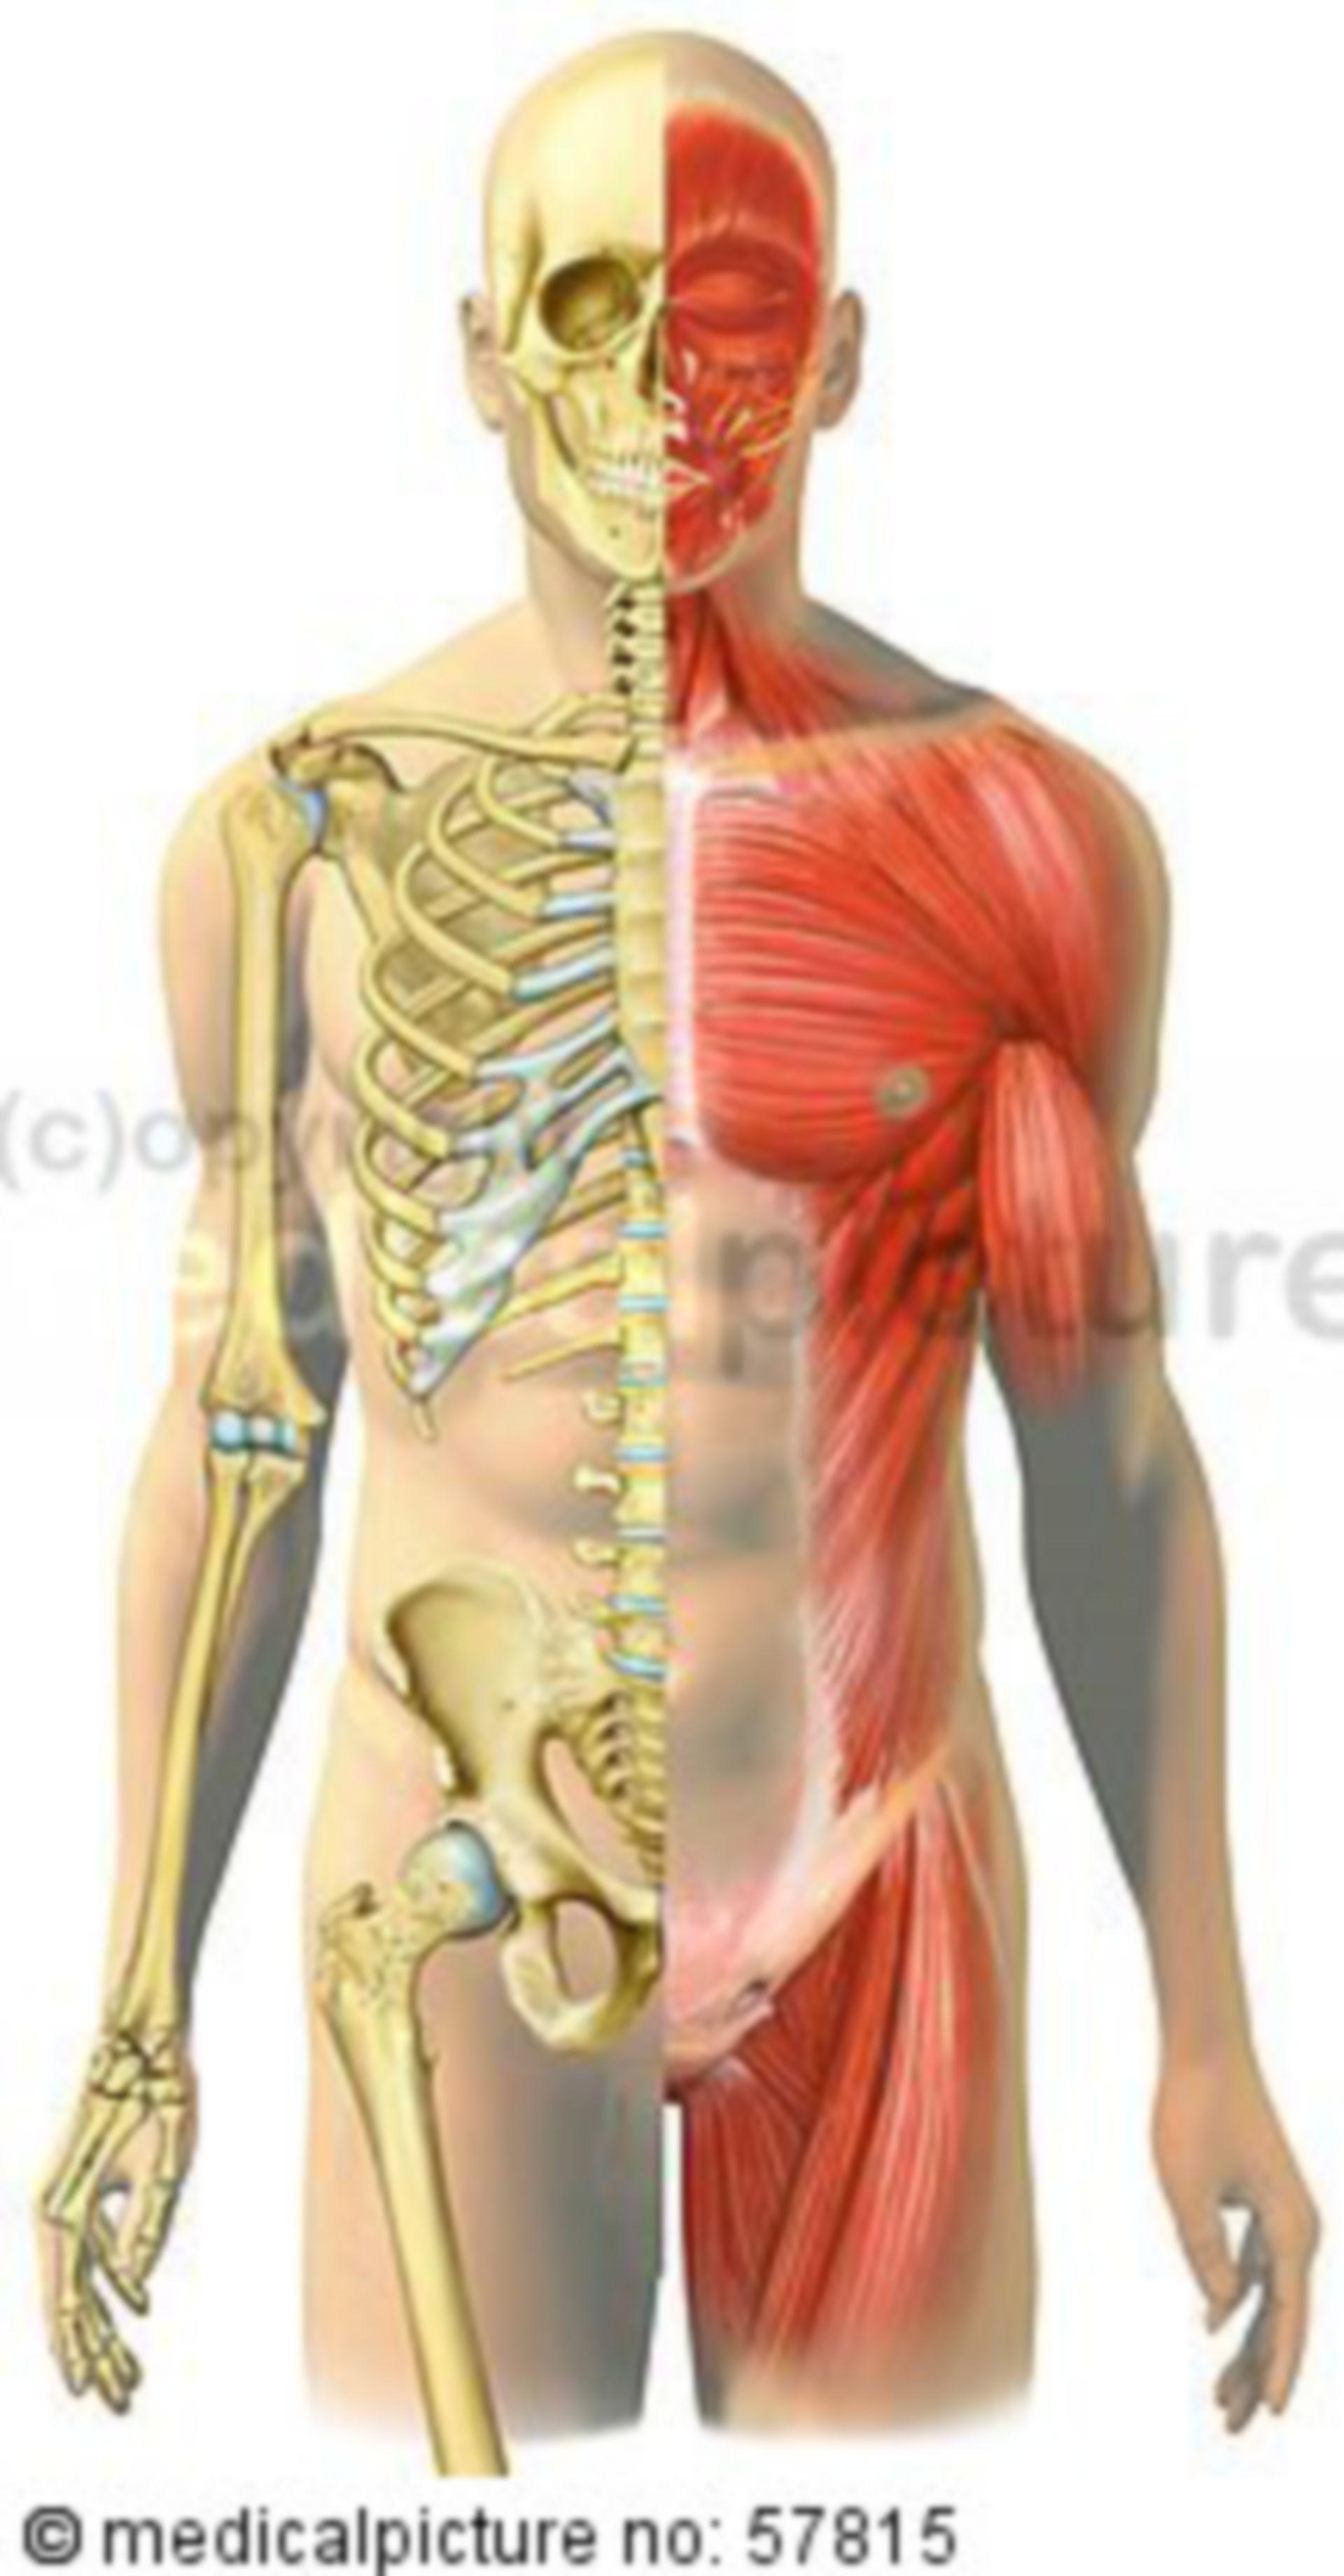 Anatomic Illustrations – Juxtaposition of Skeleton and Skeleton Muscles